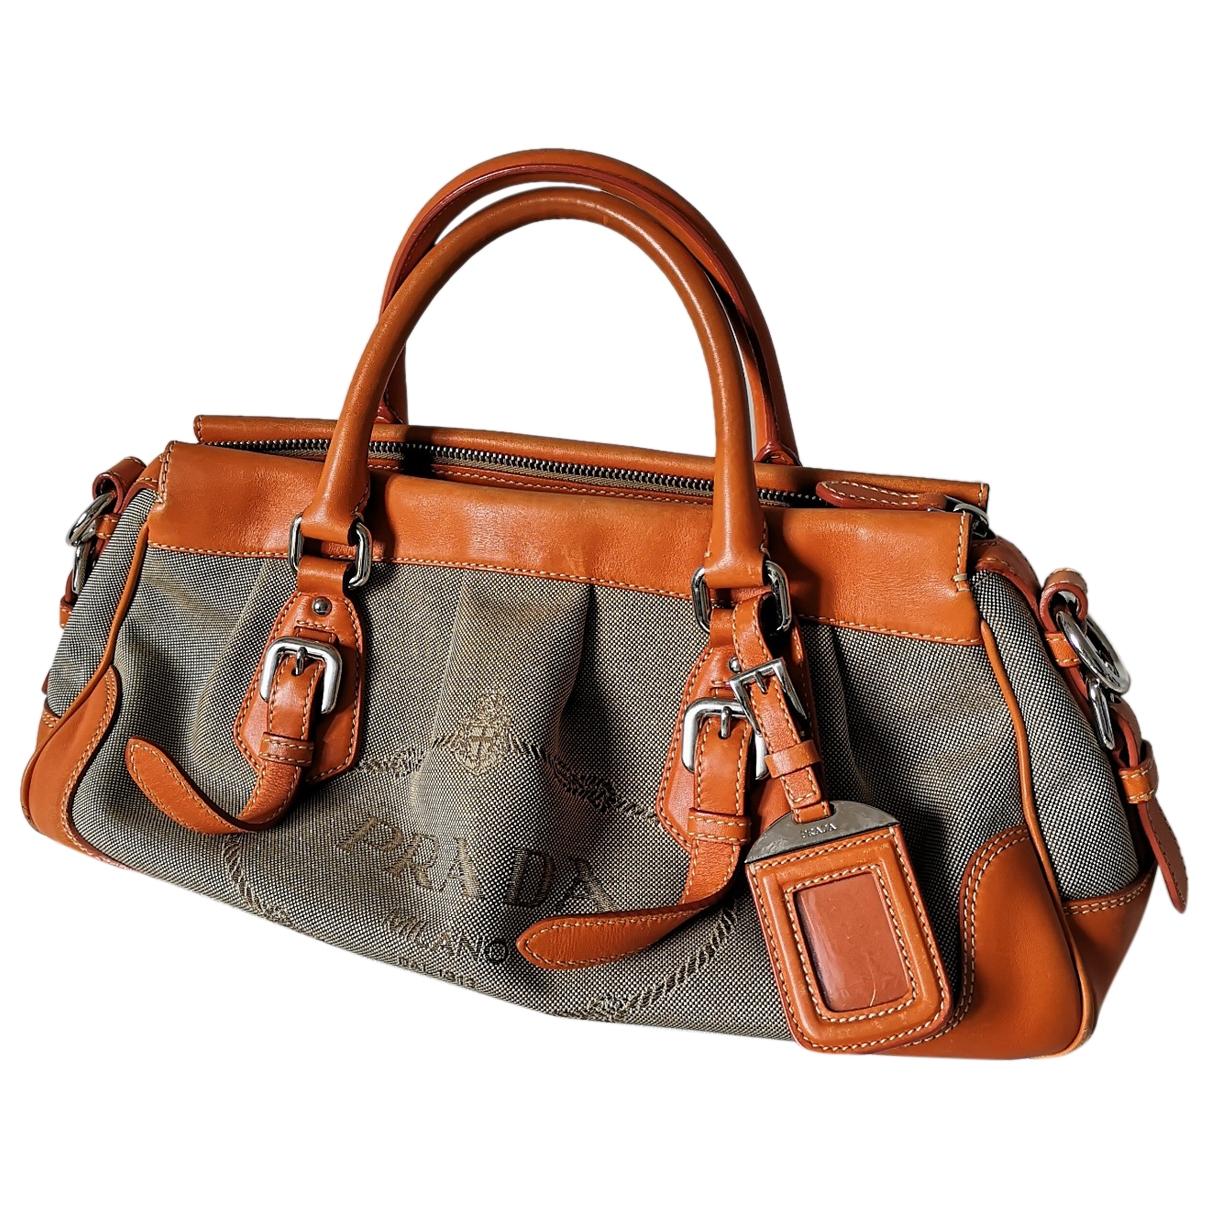 Prada \N Handtasche in  Ecru Leinen